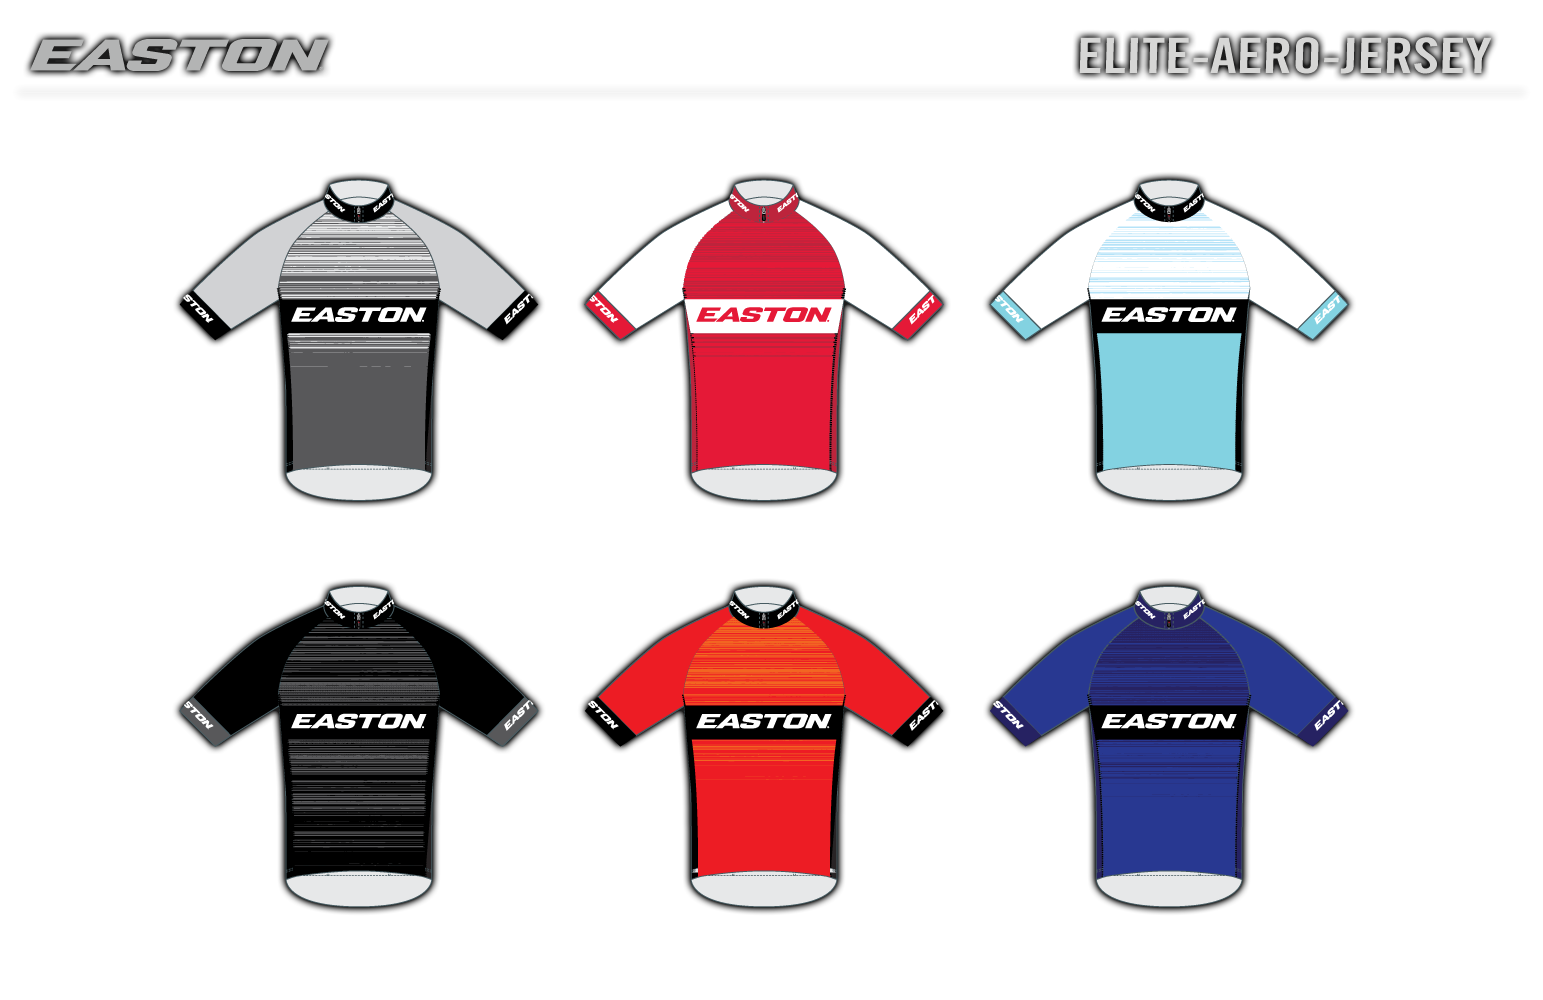 Easton Cycling Kits